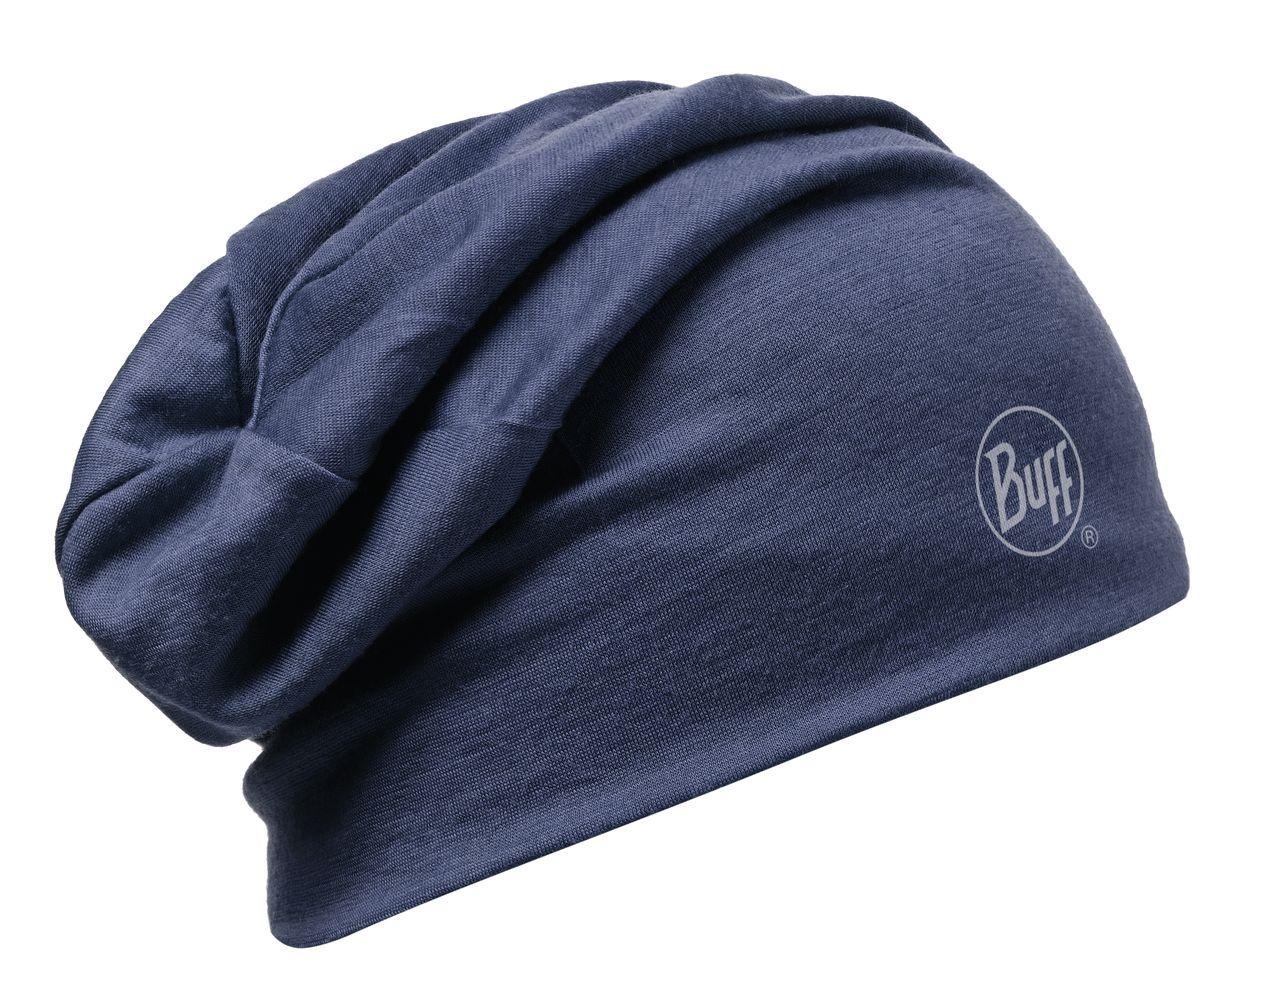 Шапка BUFF WOOL SOLID DENIM Банданы и шарфы Buff ® 1169255  - купить со скидкой